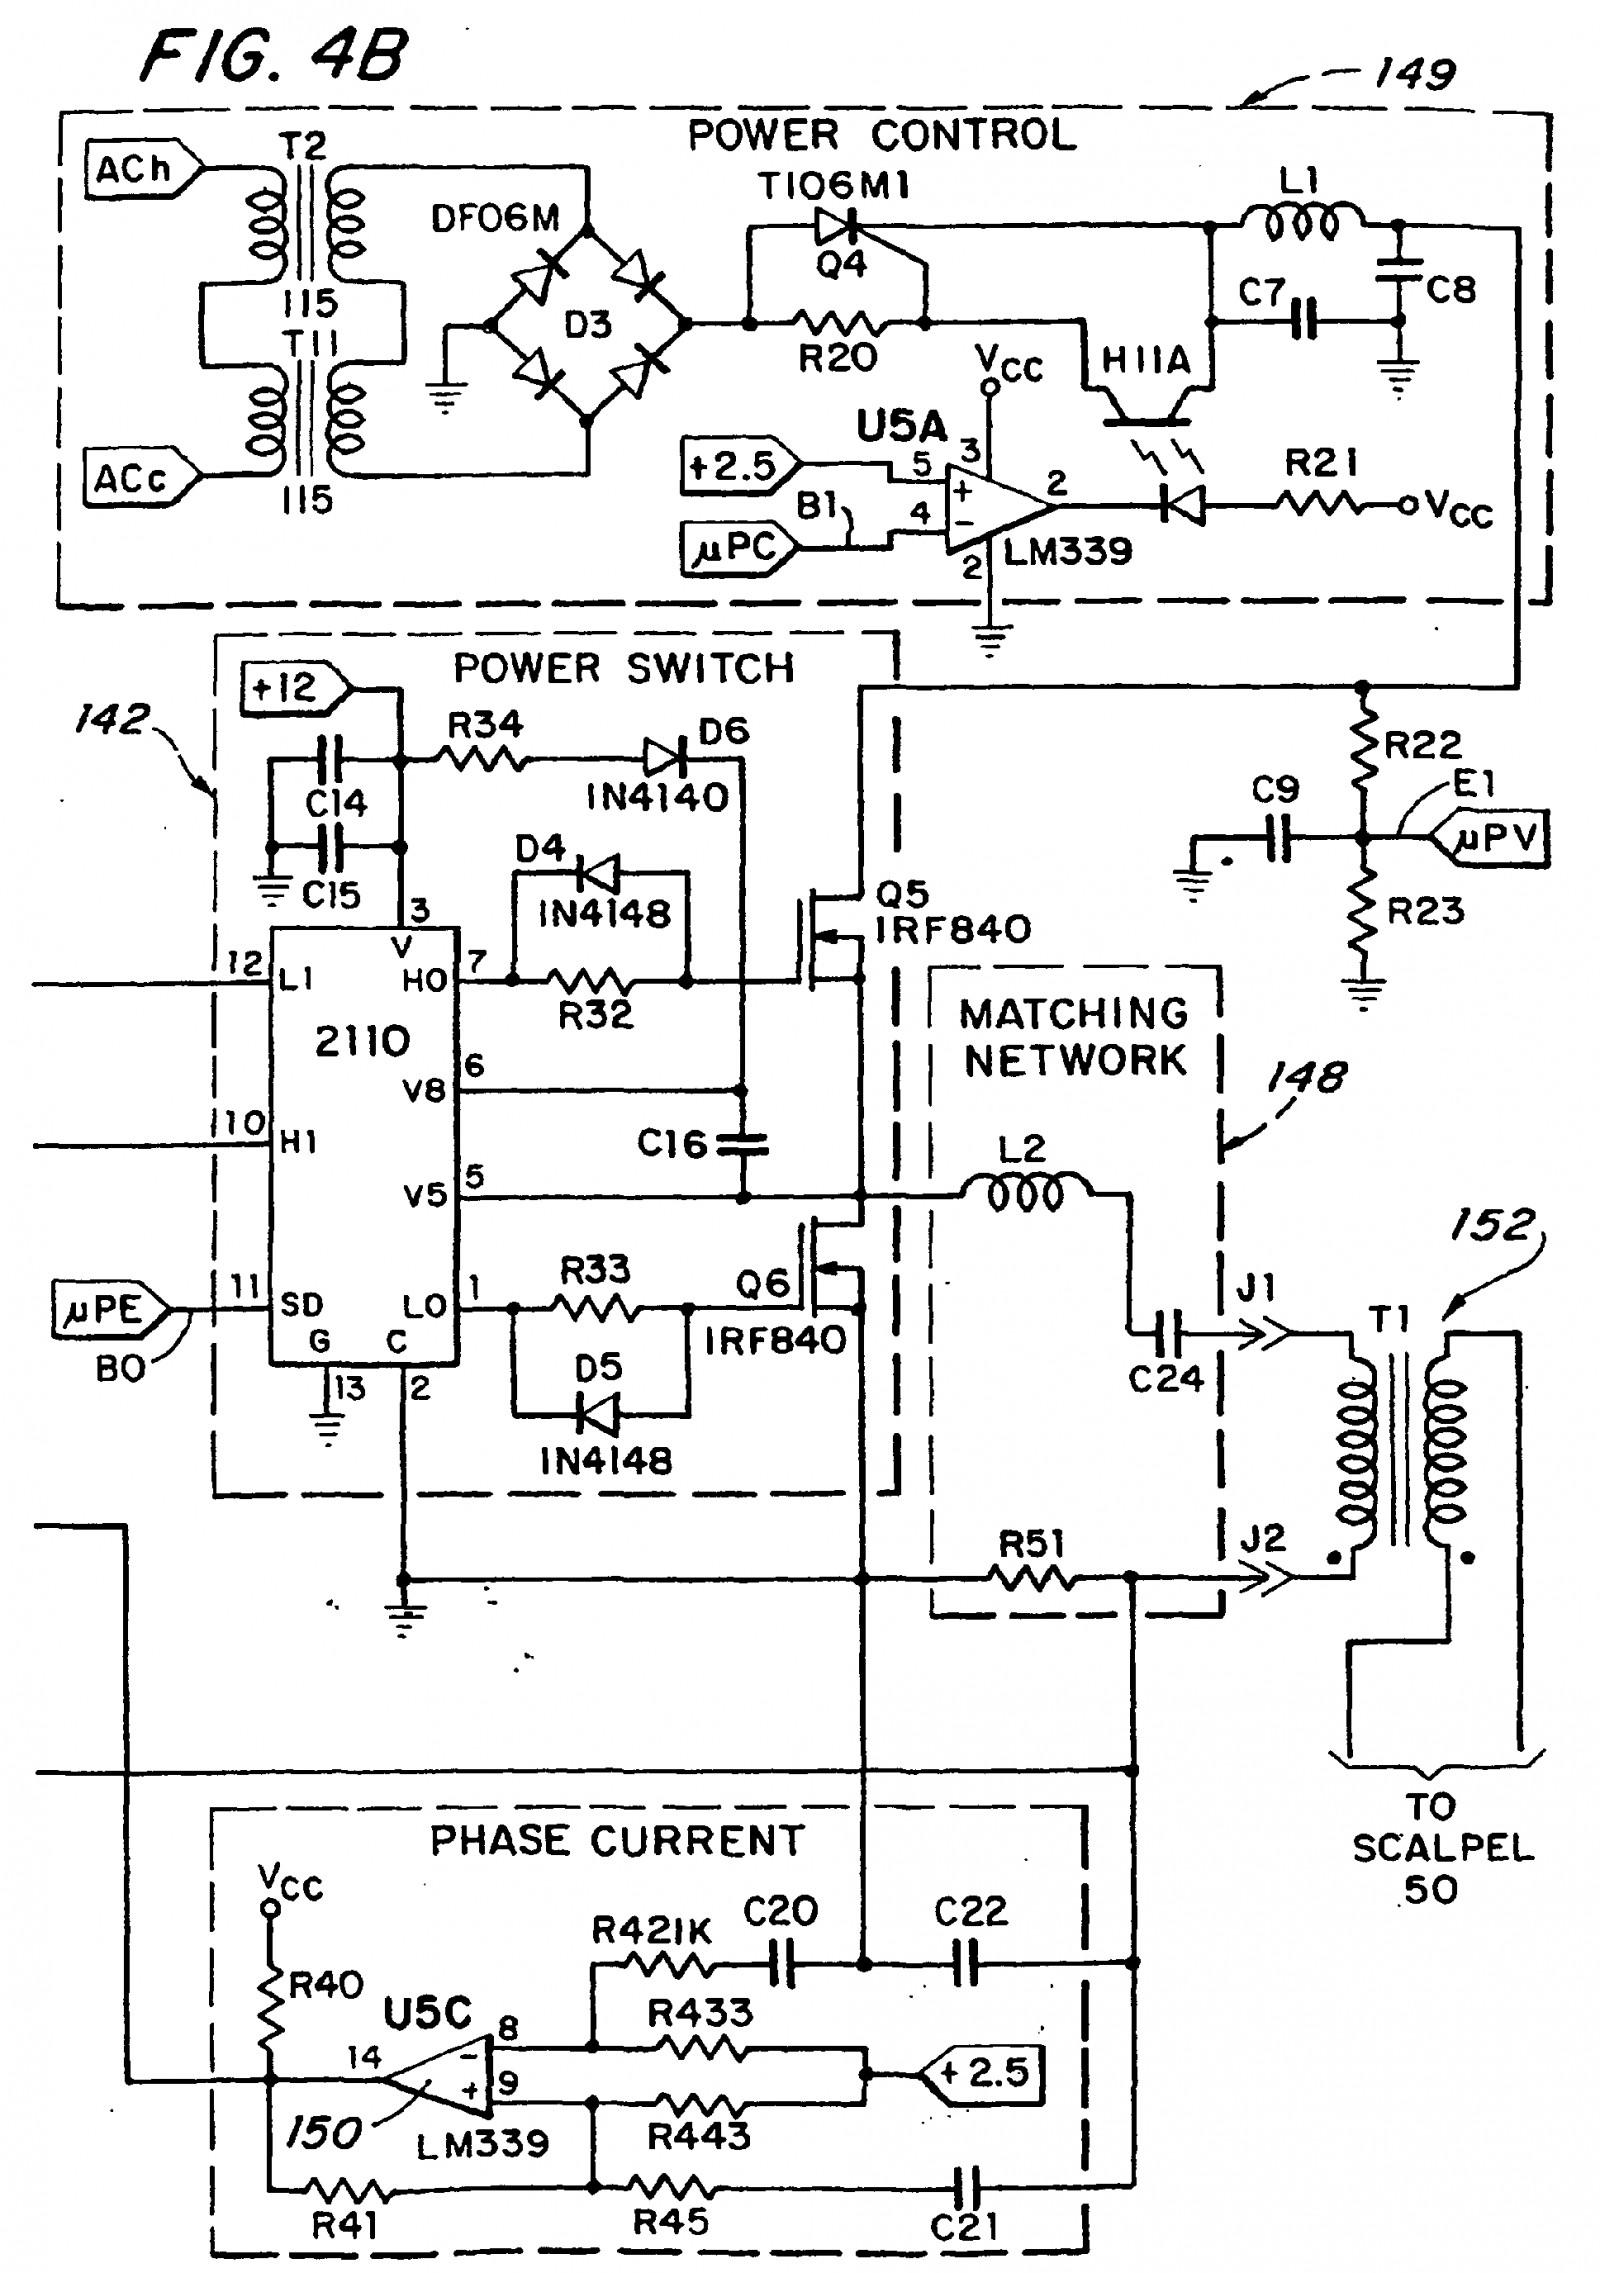 rotork wiring diagrams marine power diagram circuit drawing at getdrawings free for personal use